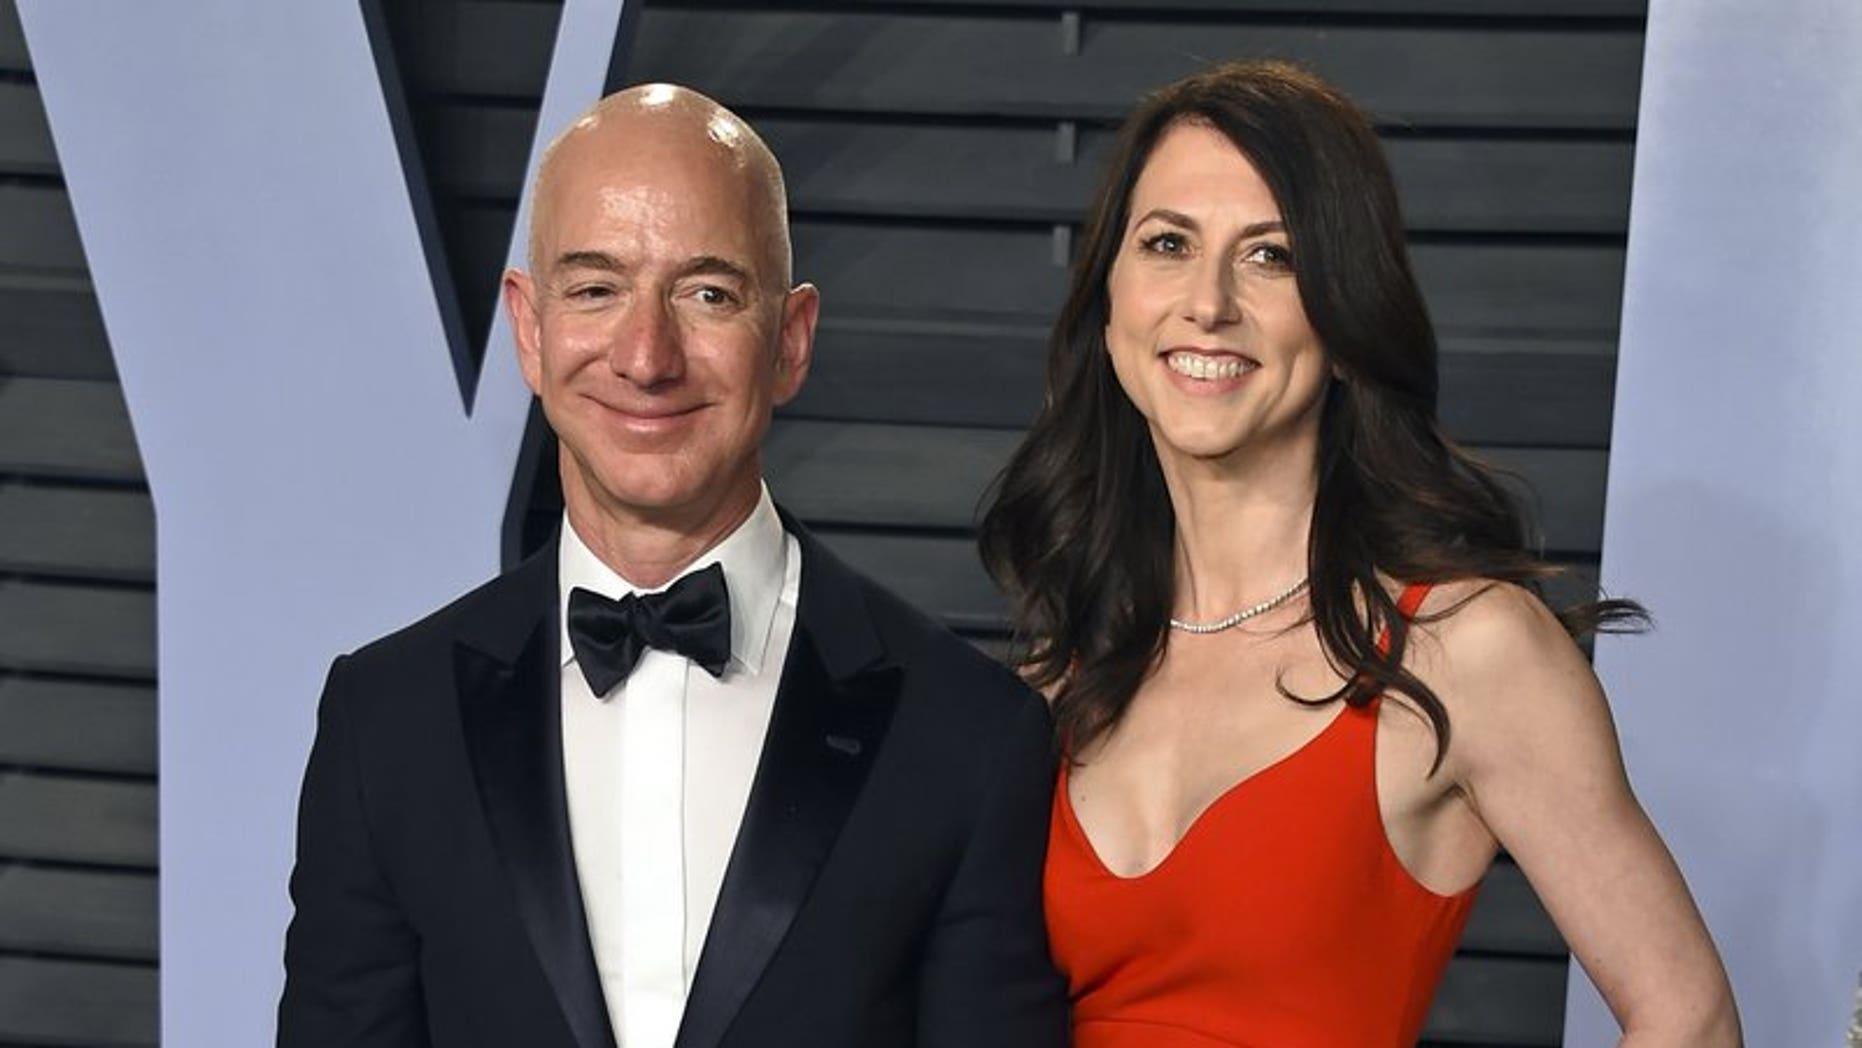 Jeff Bezos, Amazon CEO worth $137 billion, to divorce wife of 25 years